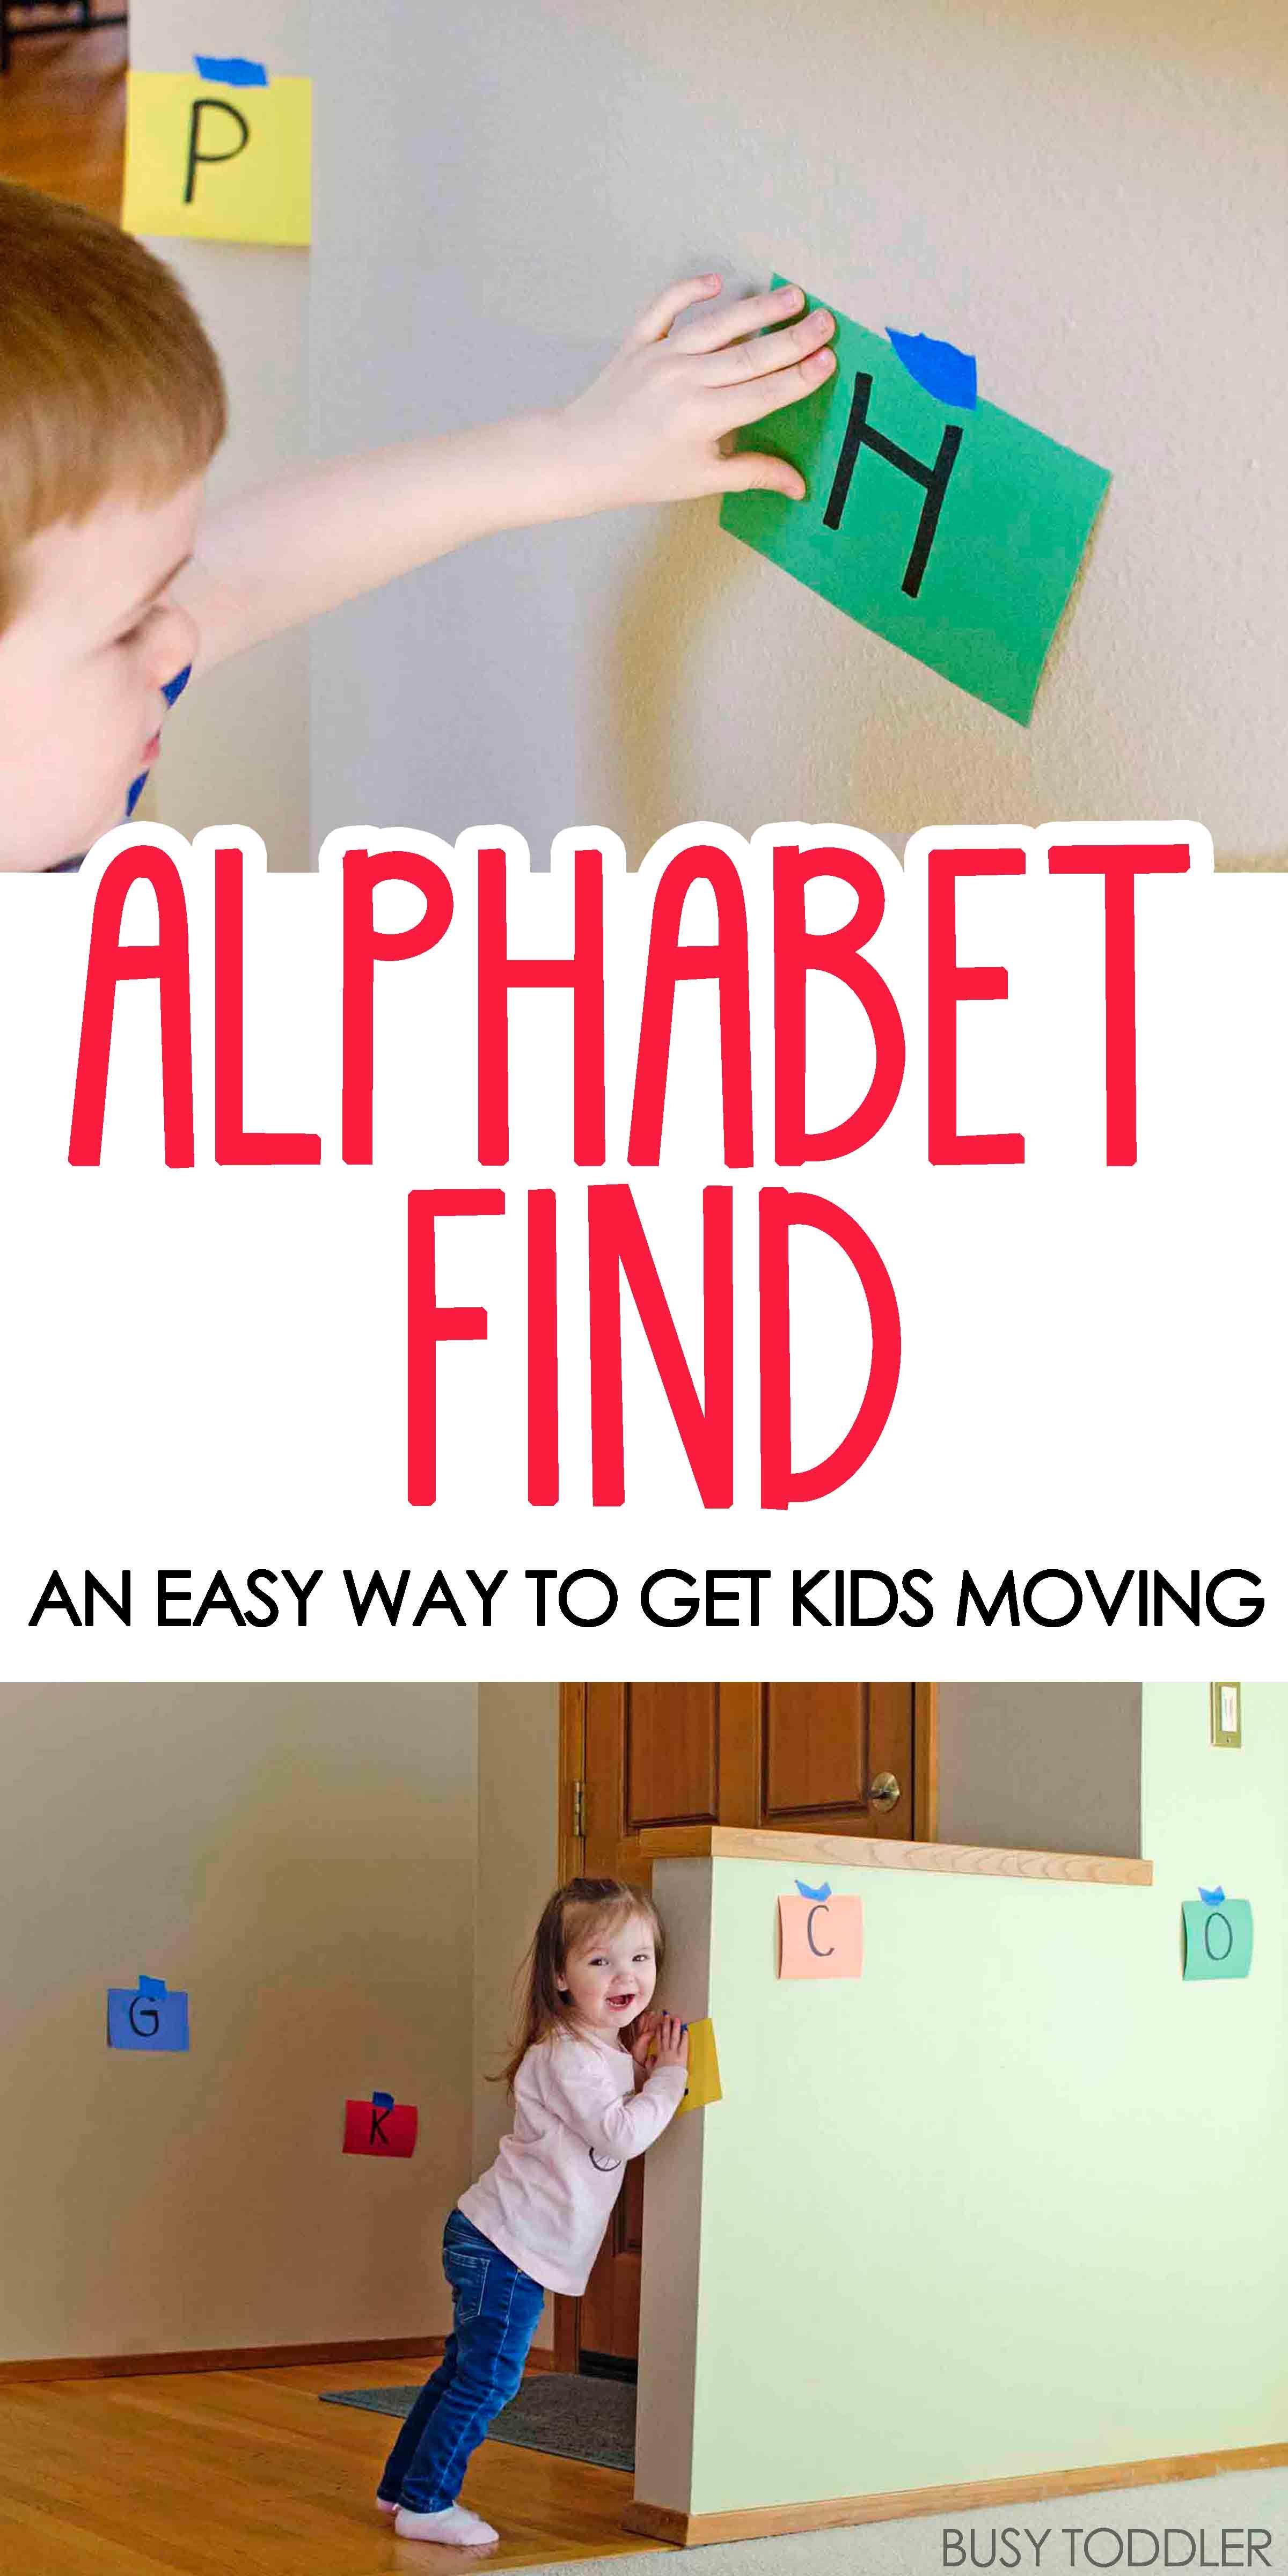 find the alphabet # 34